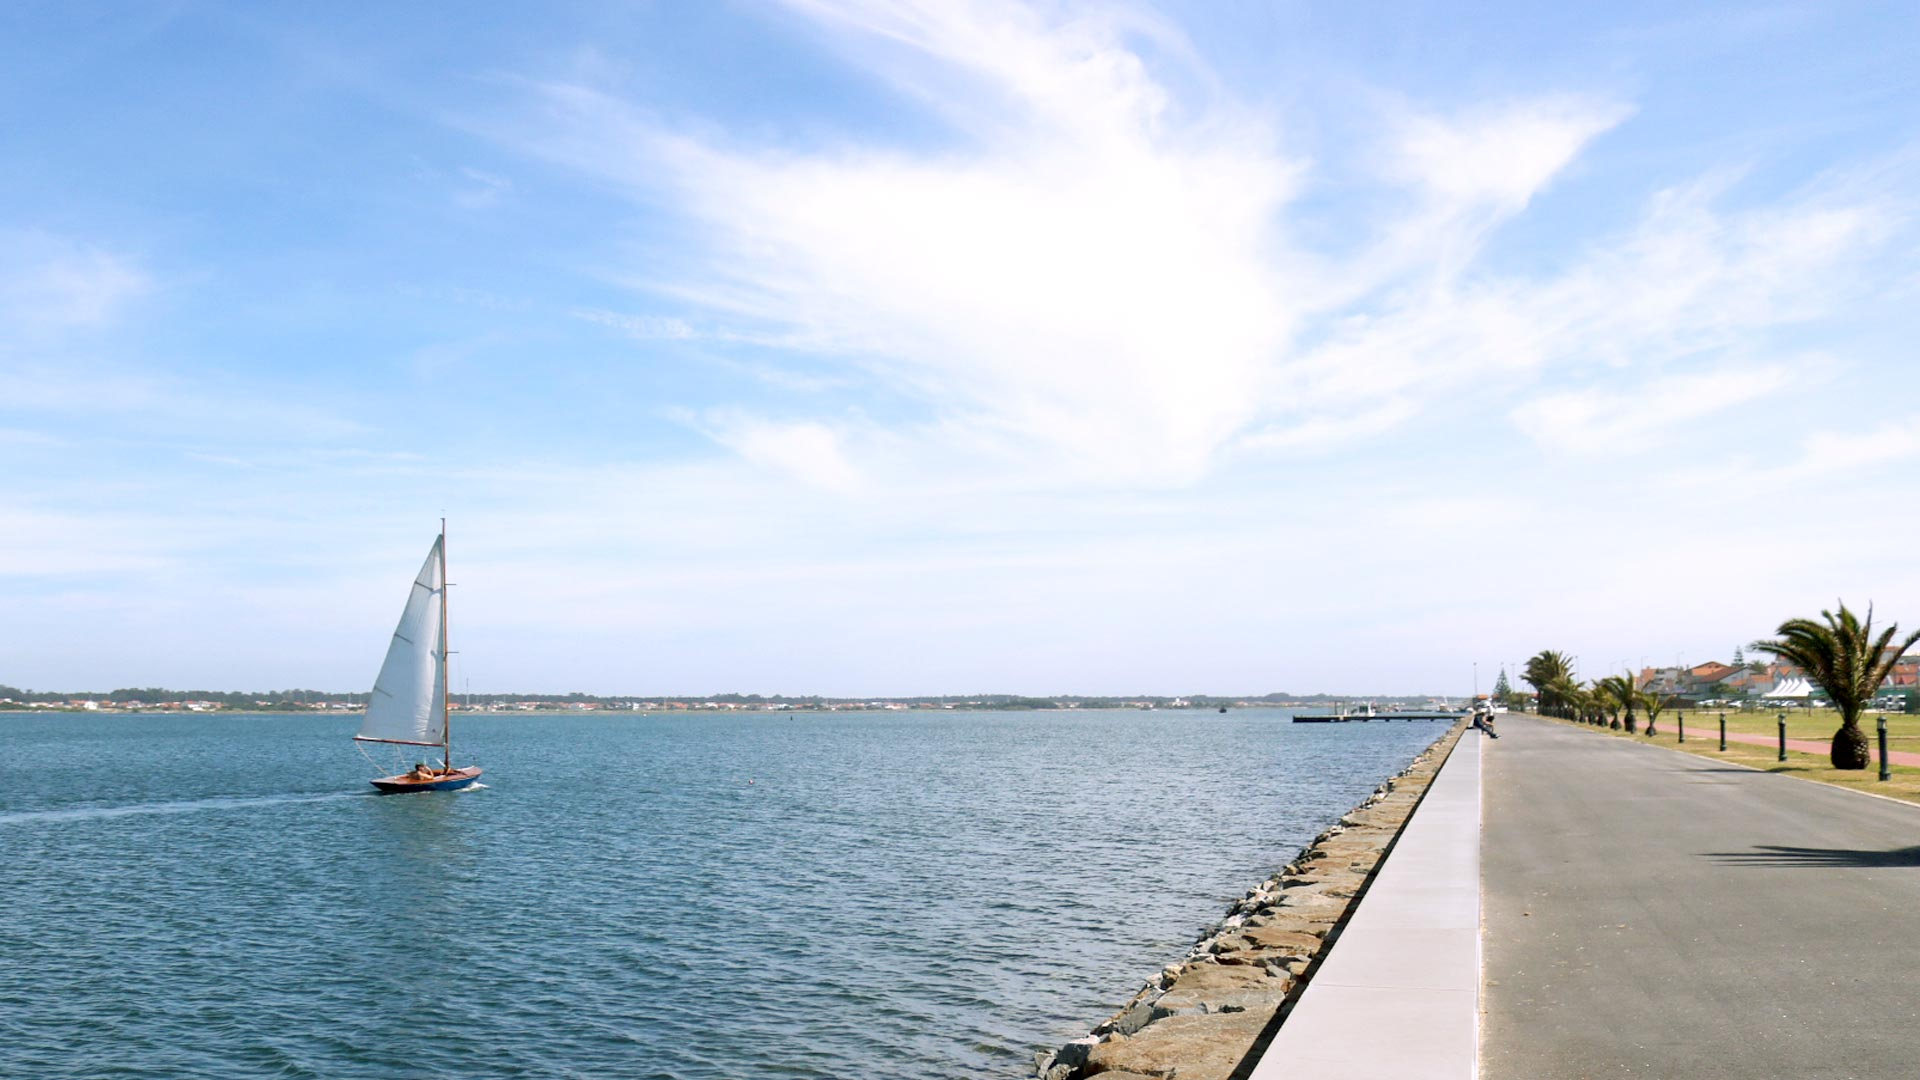 ilhavo-gafanha-da-encarnacao-praia-da-barra-Aveiro-ville-real-estate-imobiliaria-comprar-arrendar-vender-moradia-apartamento-casa-t0-t1-t2-t3-t4-2